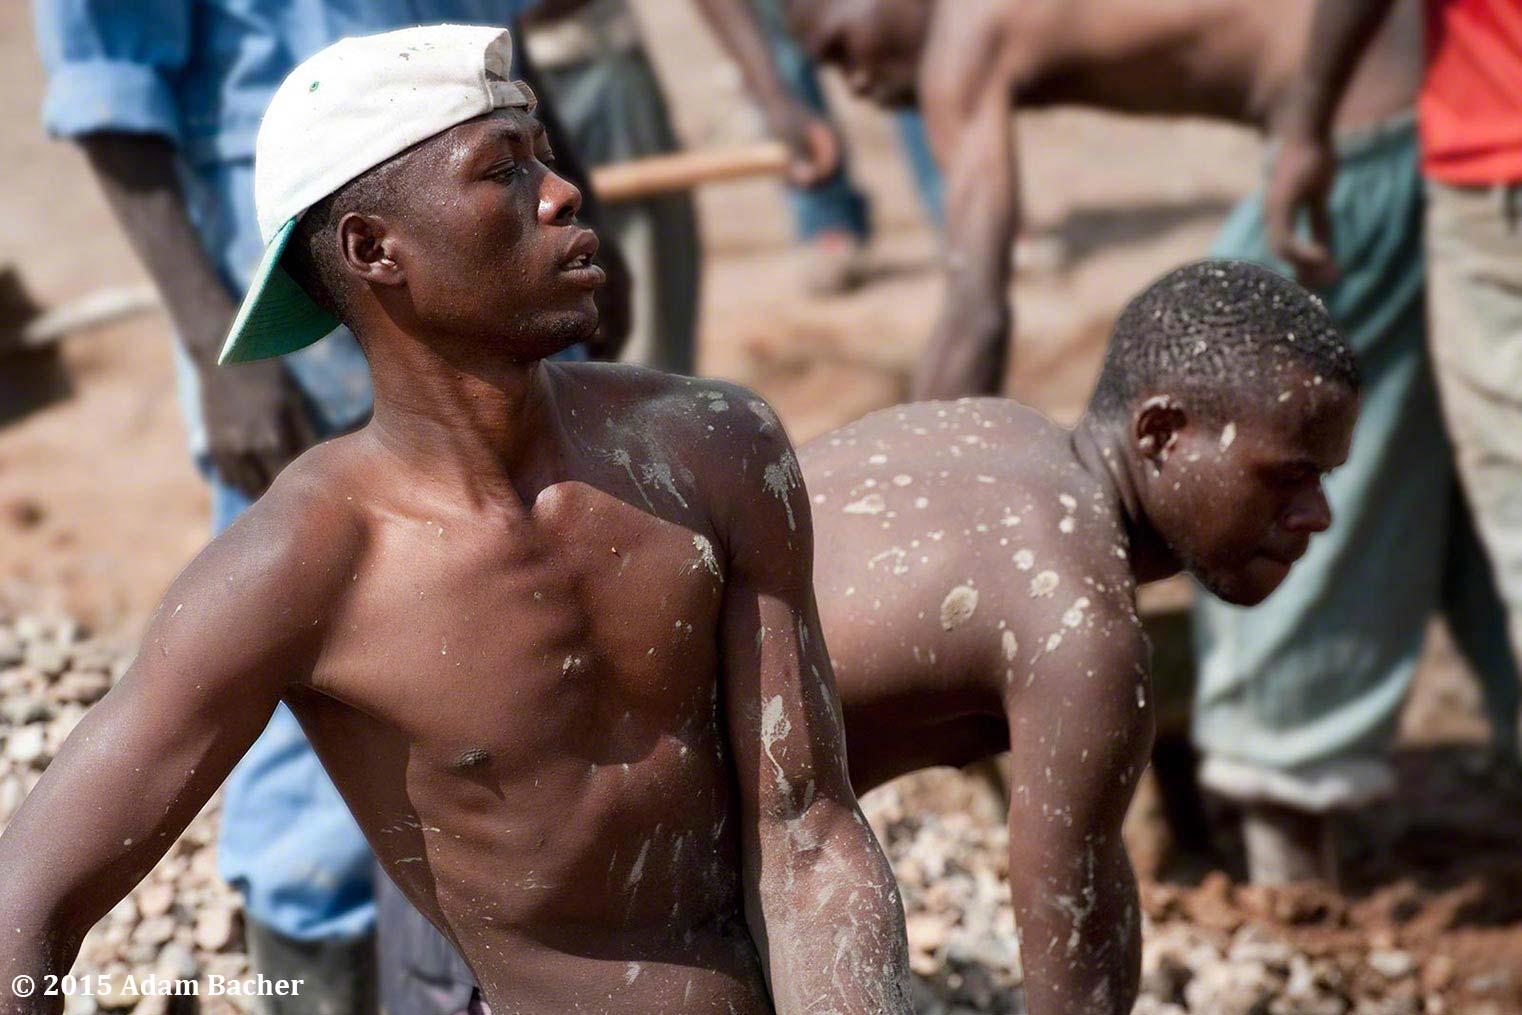 Reflections on Labor Day – Building a School in Rwanda